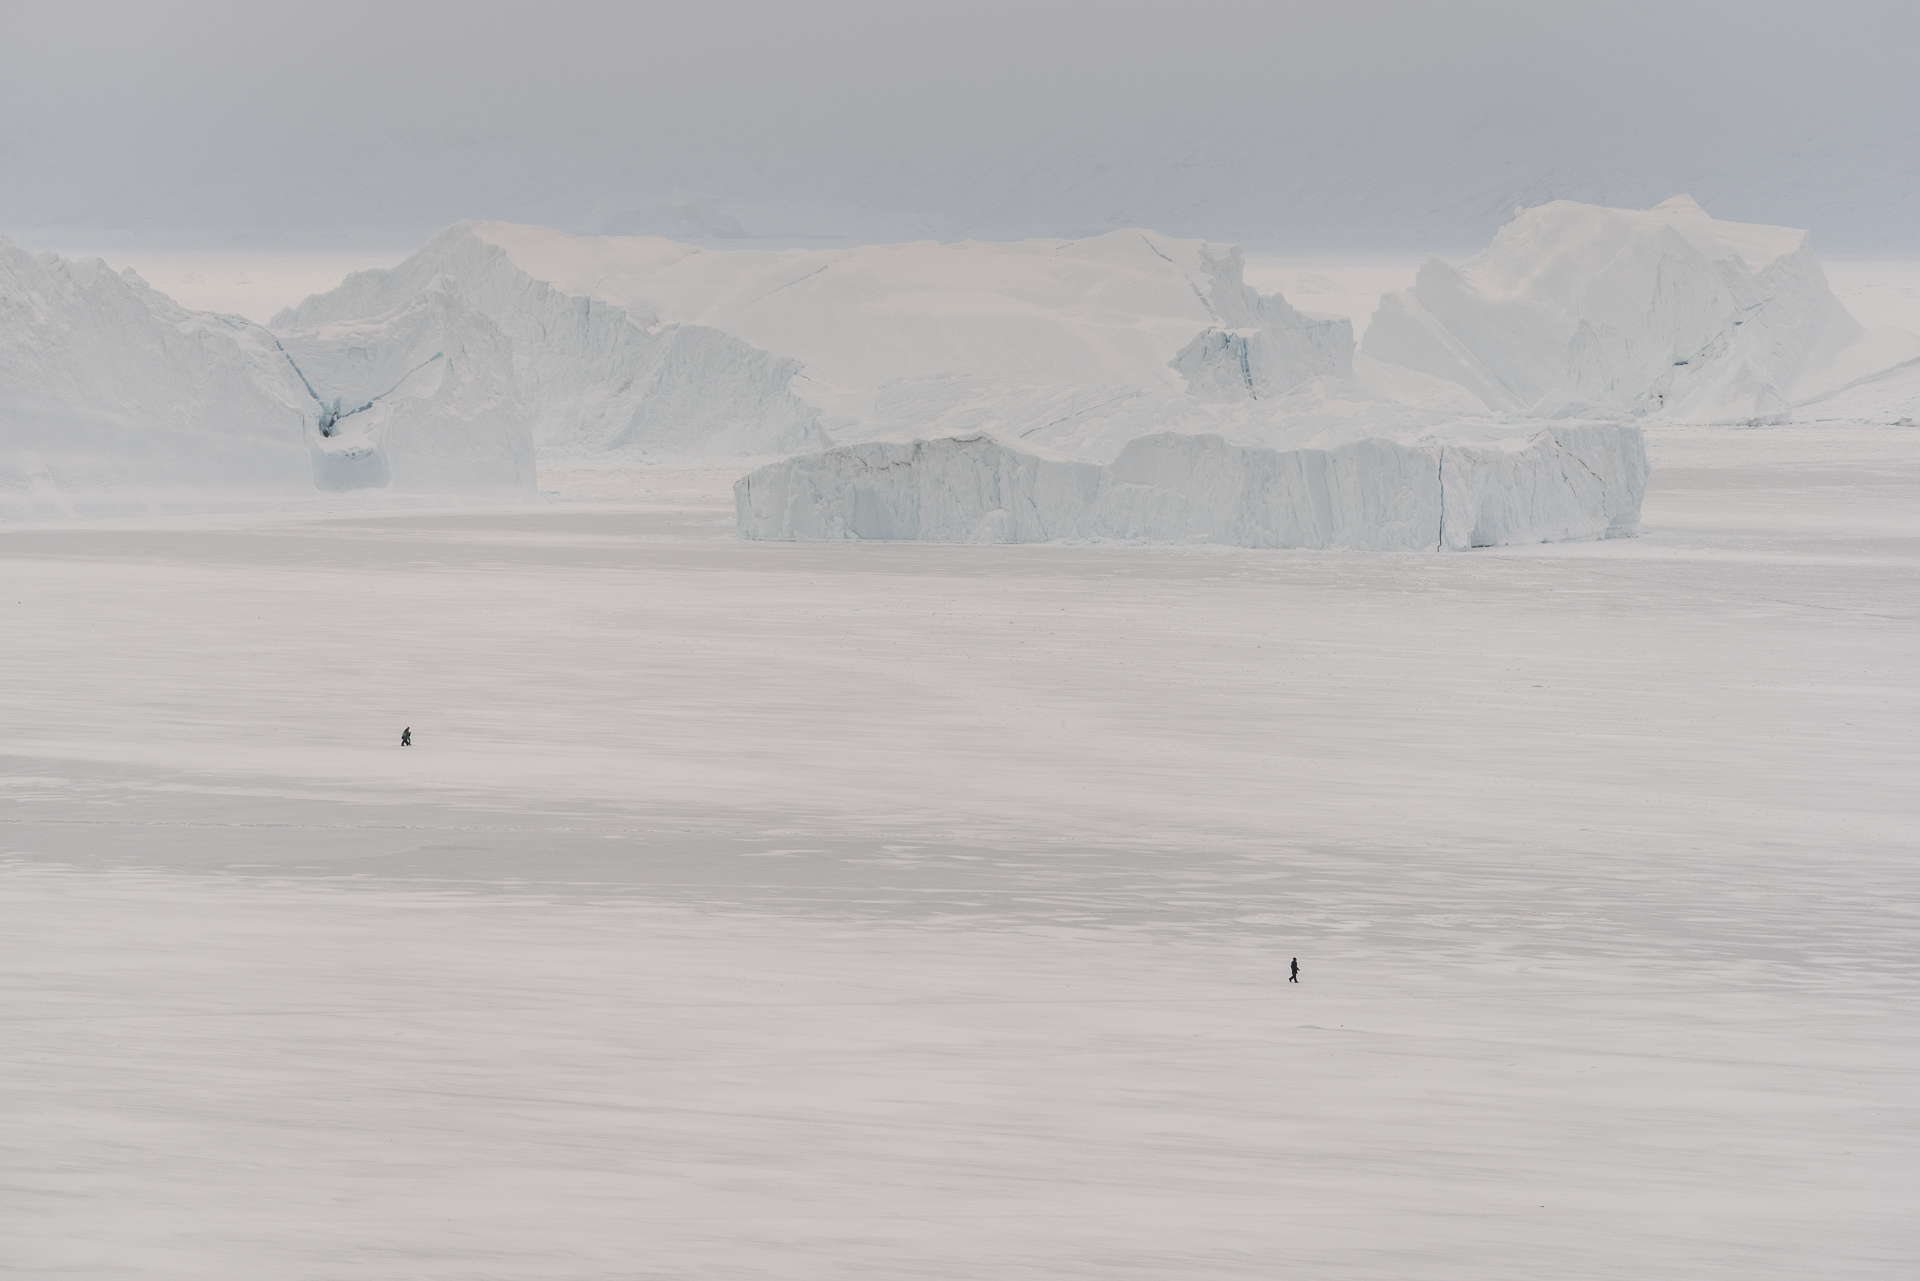 Defibaugh_Greenland_Uummannaq_a_112.jpg